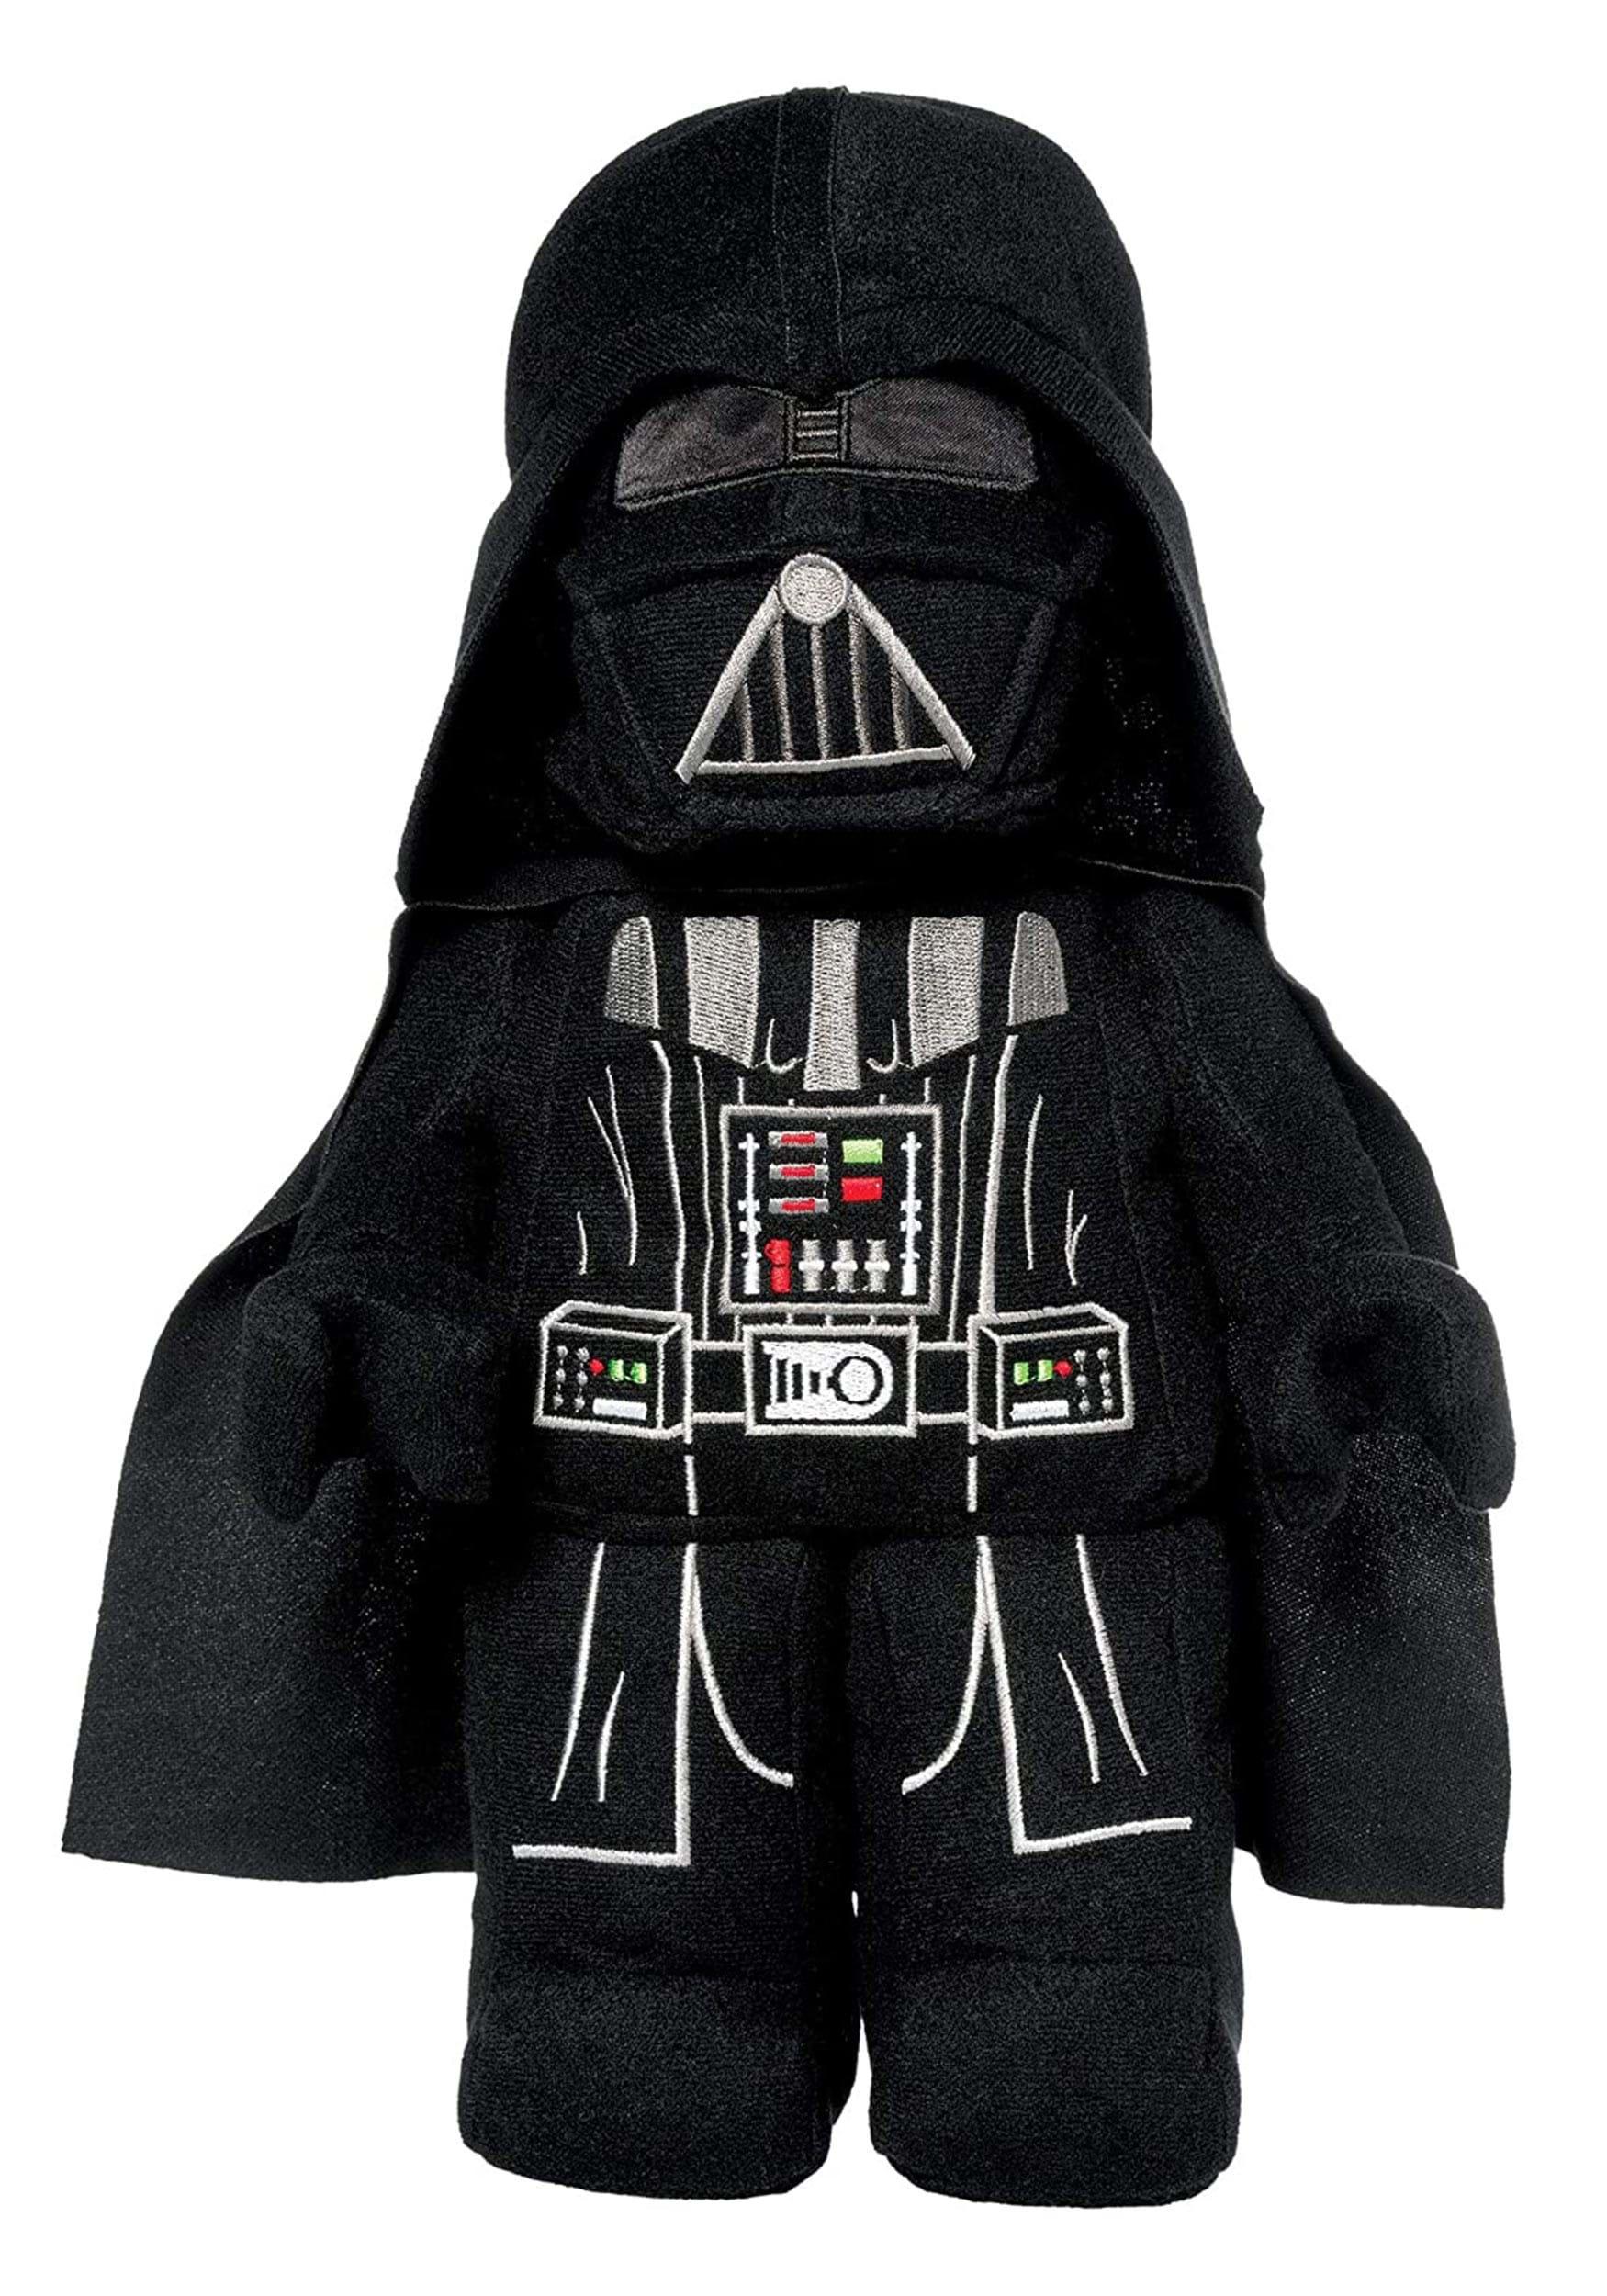 LEGO Star Wars Darth Vader Stuffed Figure